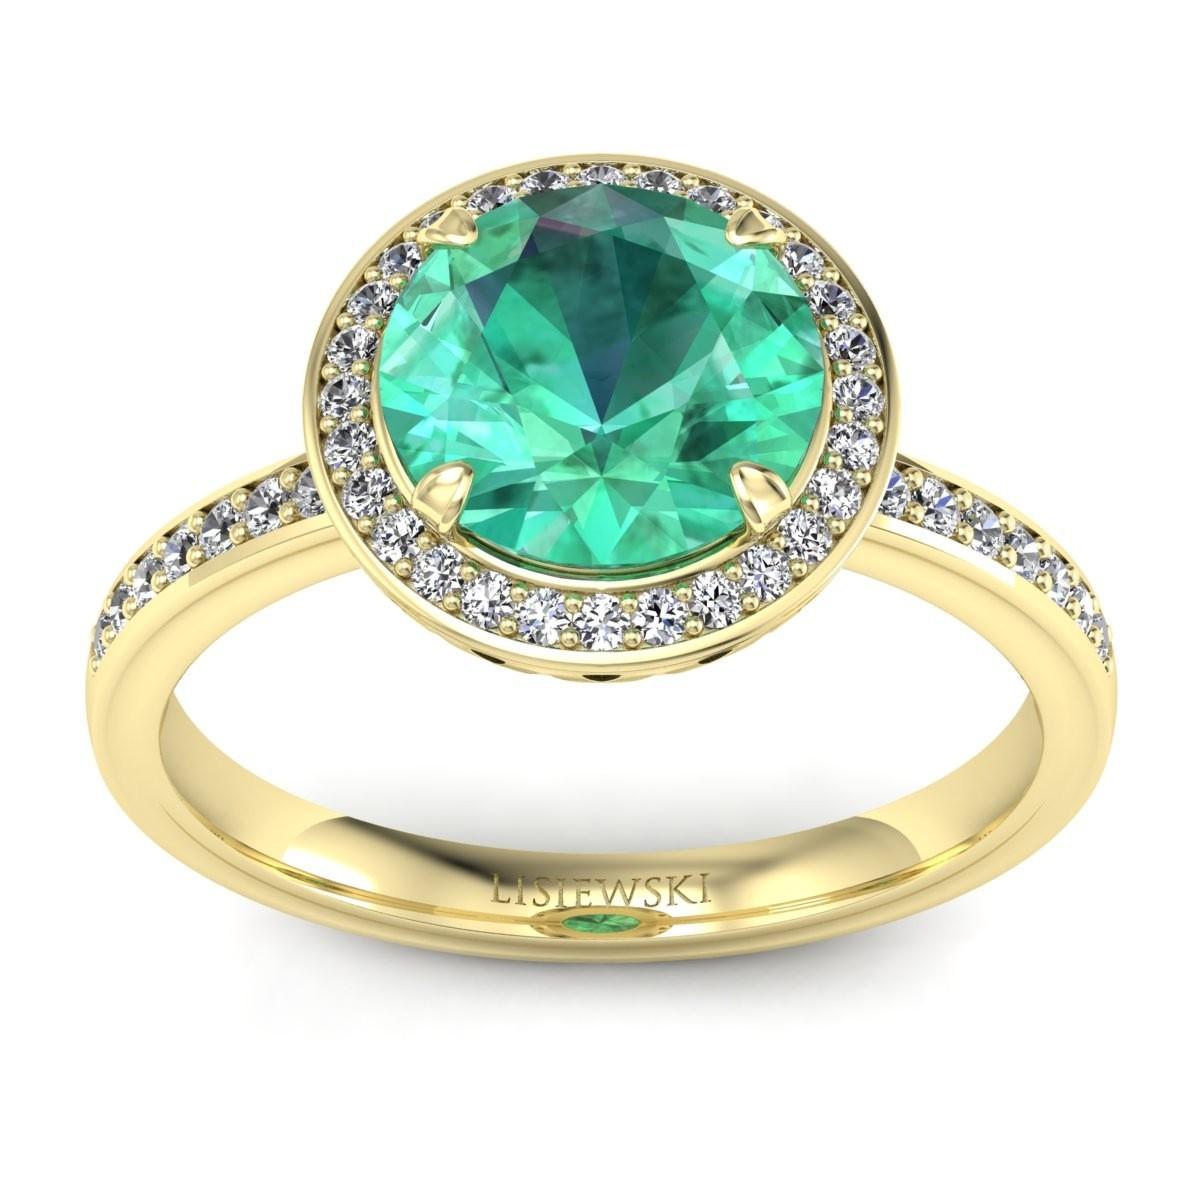 Manhattan - Złoty pierścionek ze szmaragdem i diamentami